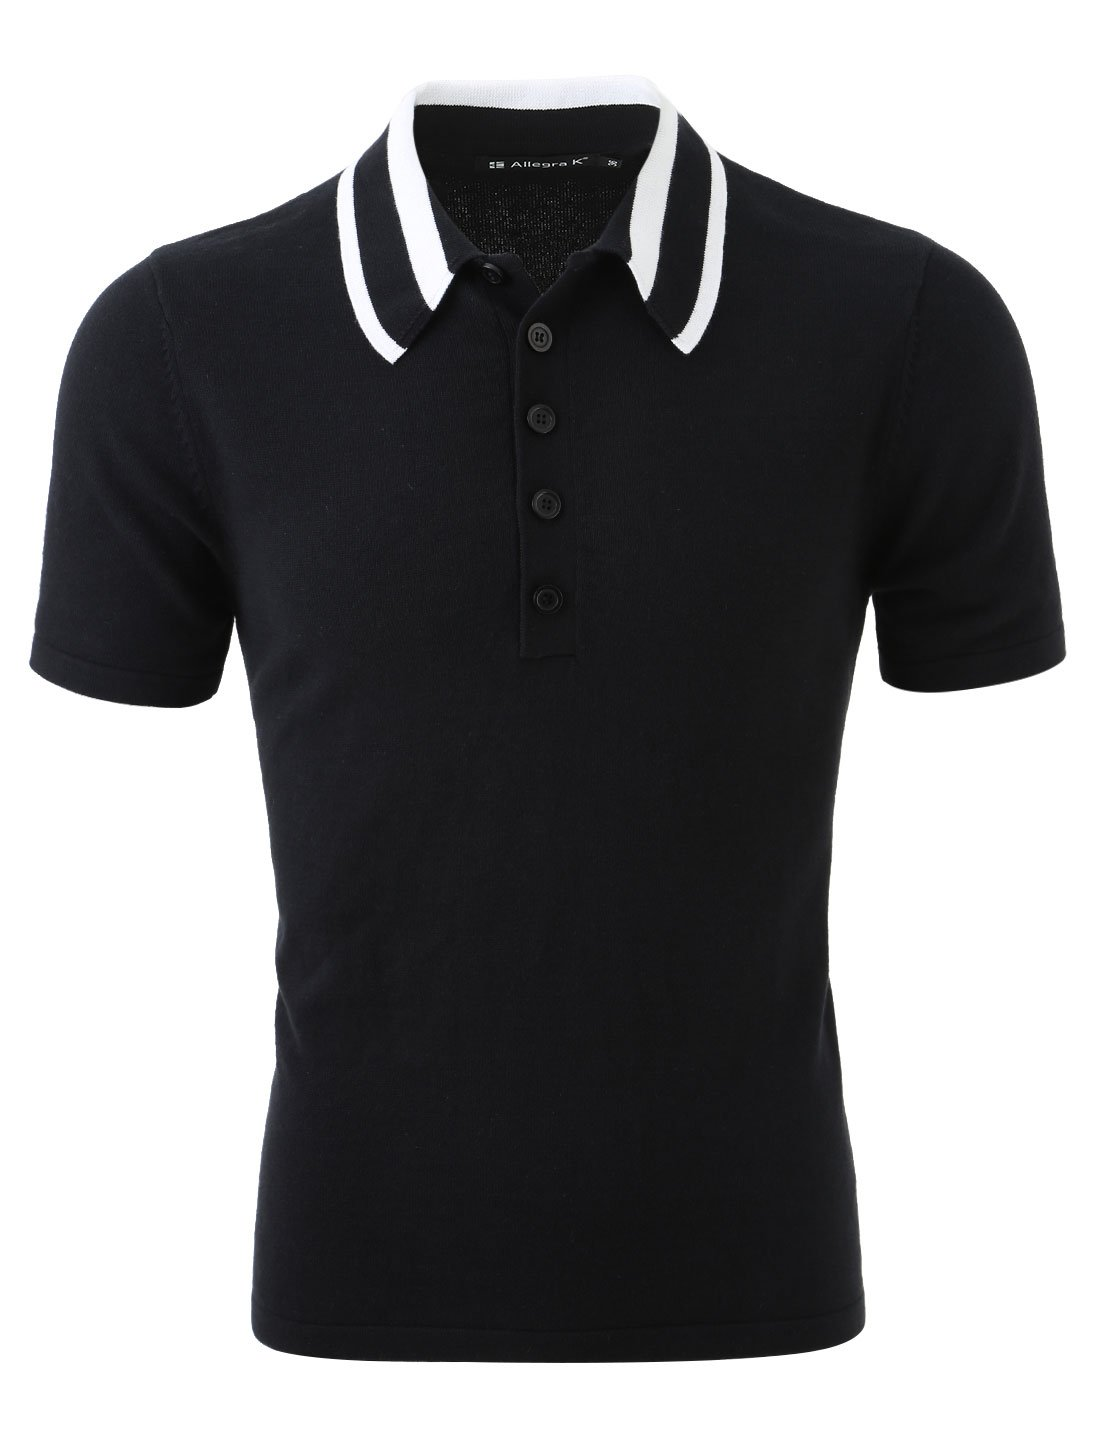 Allegra K Men Contrast-colored Collar Half Buttoned Placket Sweater Black L